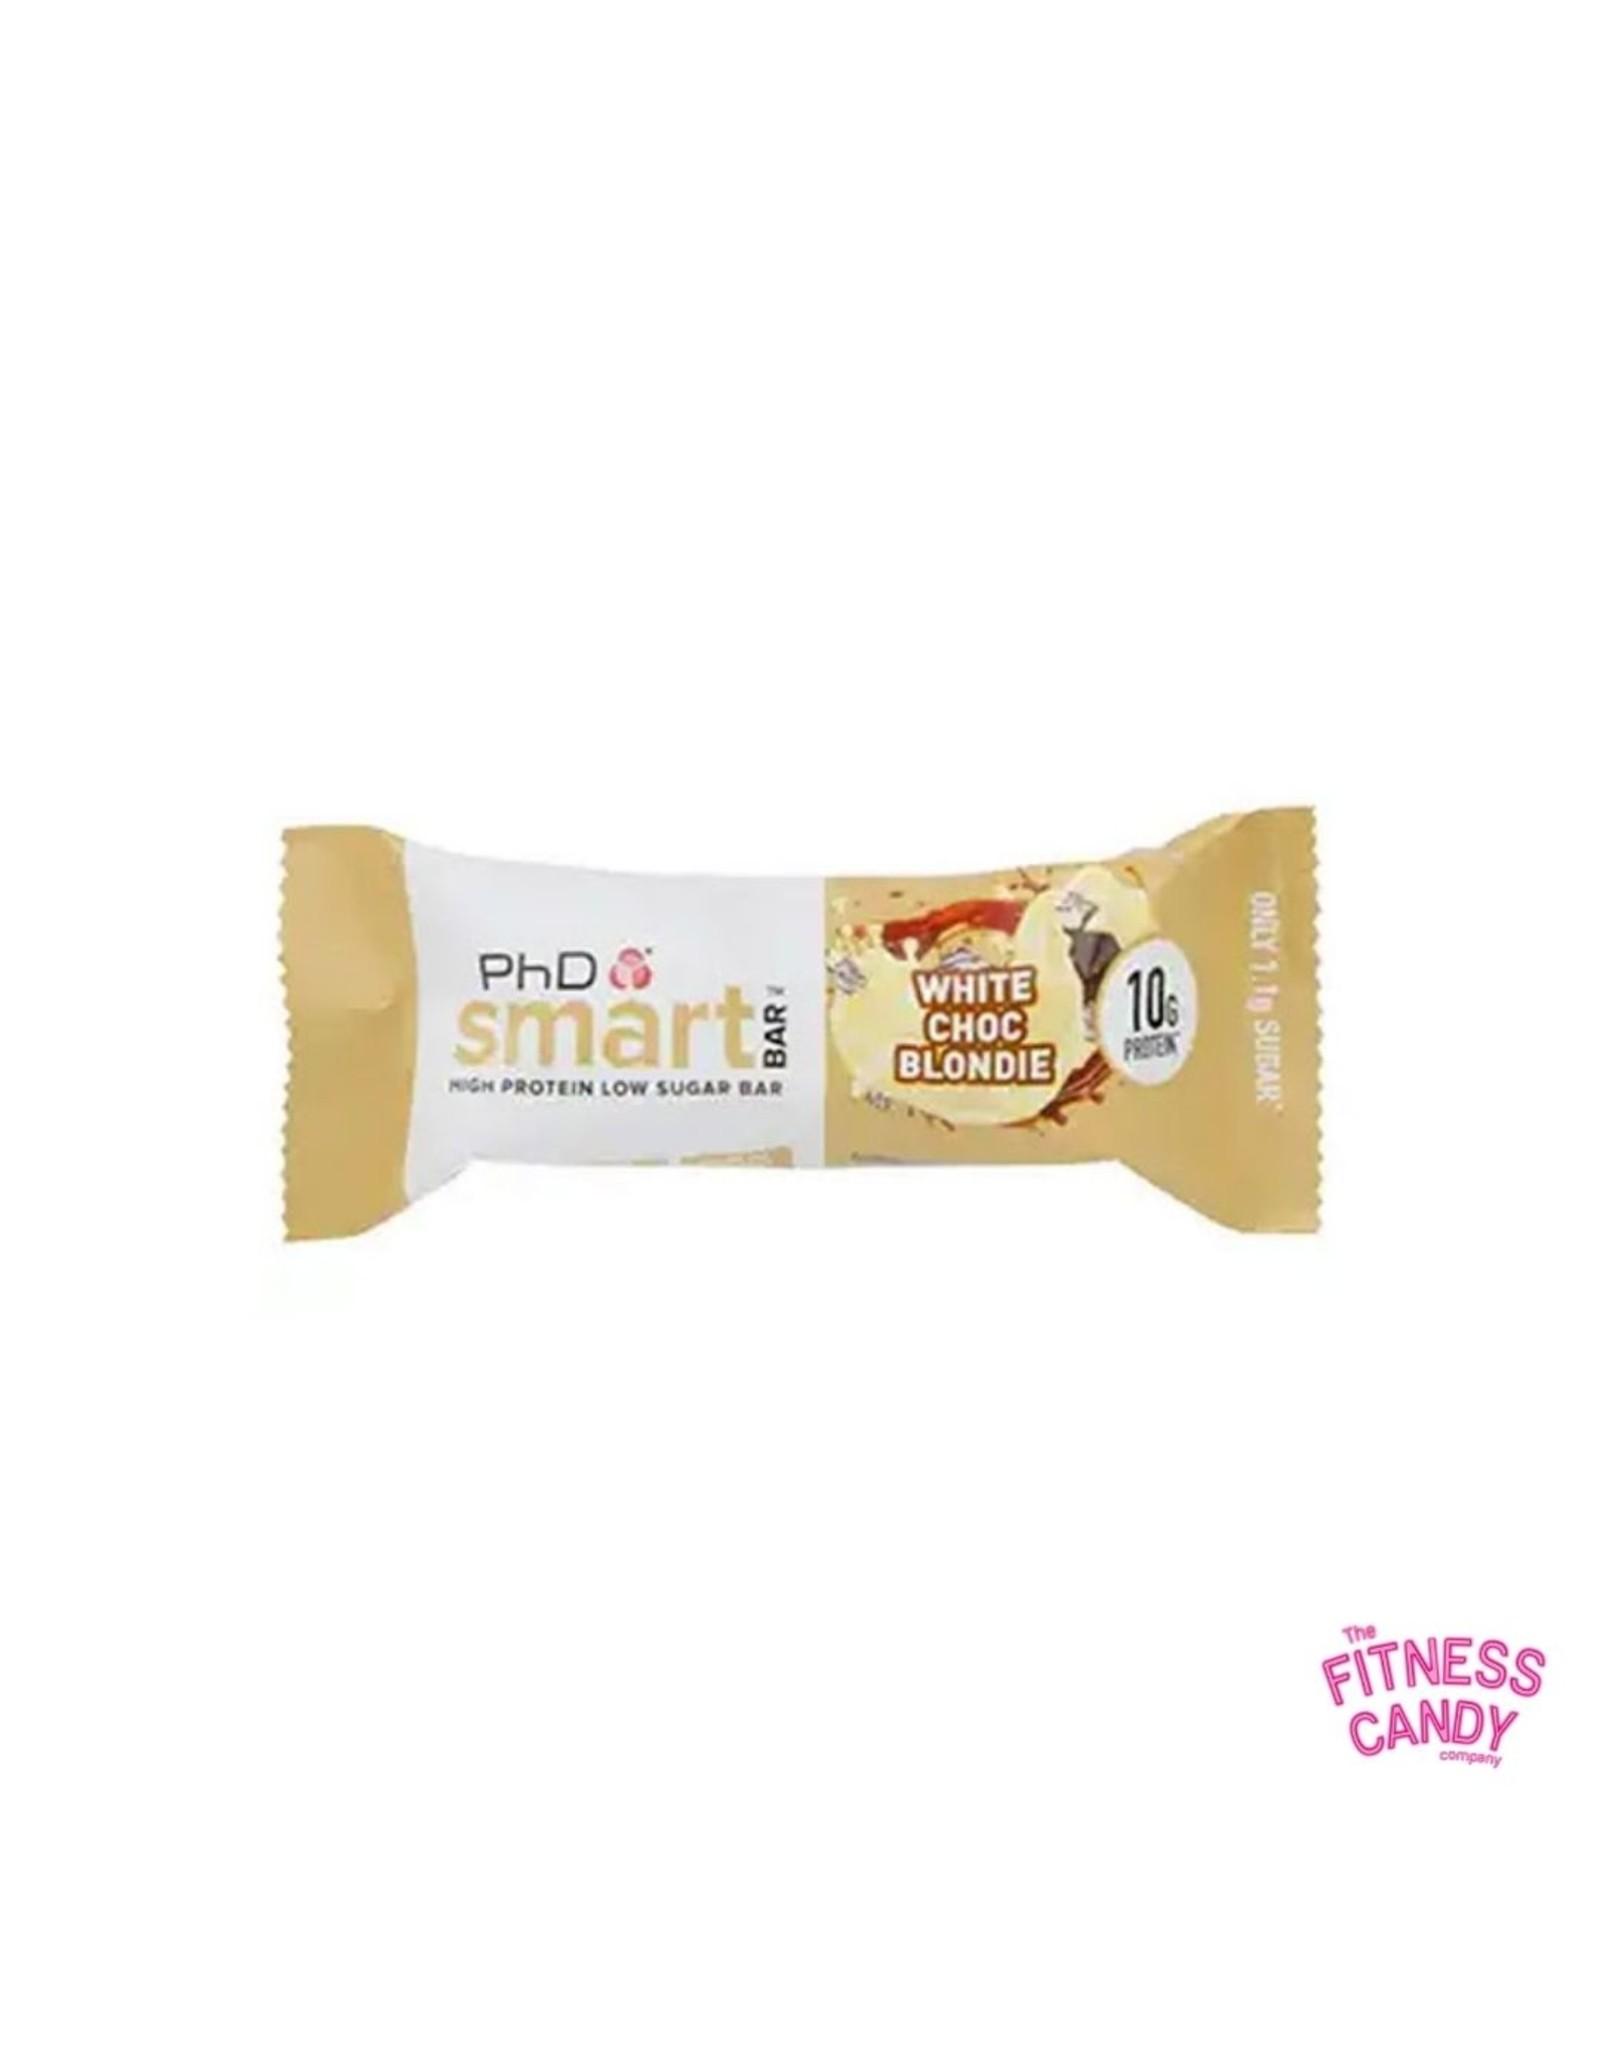 PhD PhD SMART BAR White Chocolate Blondie